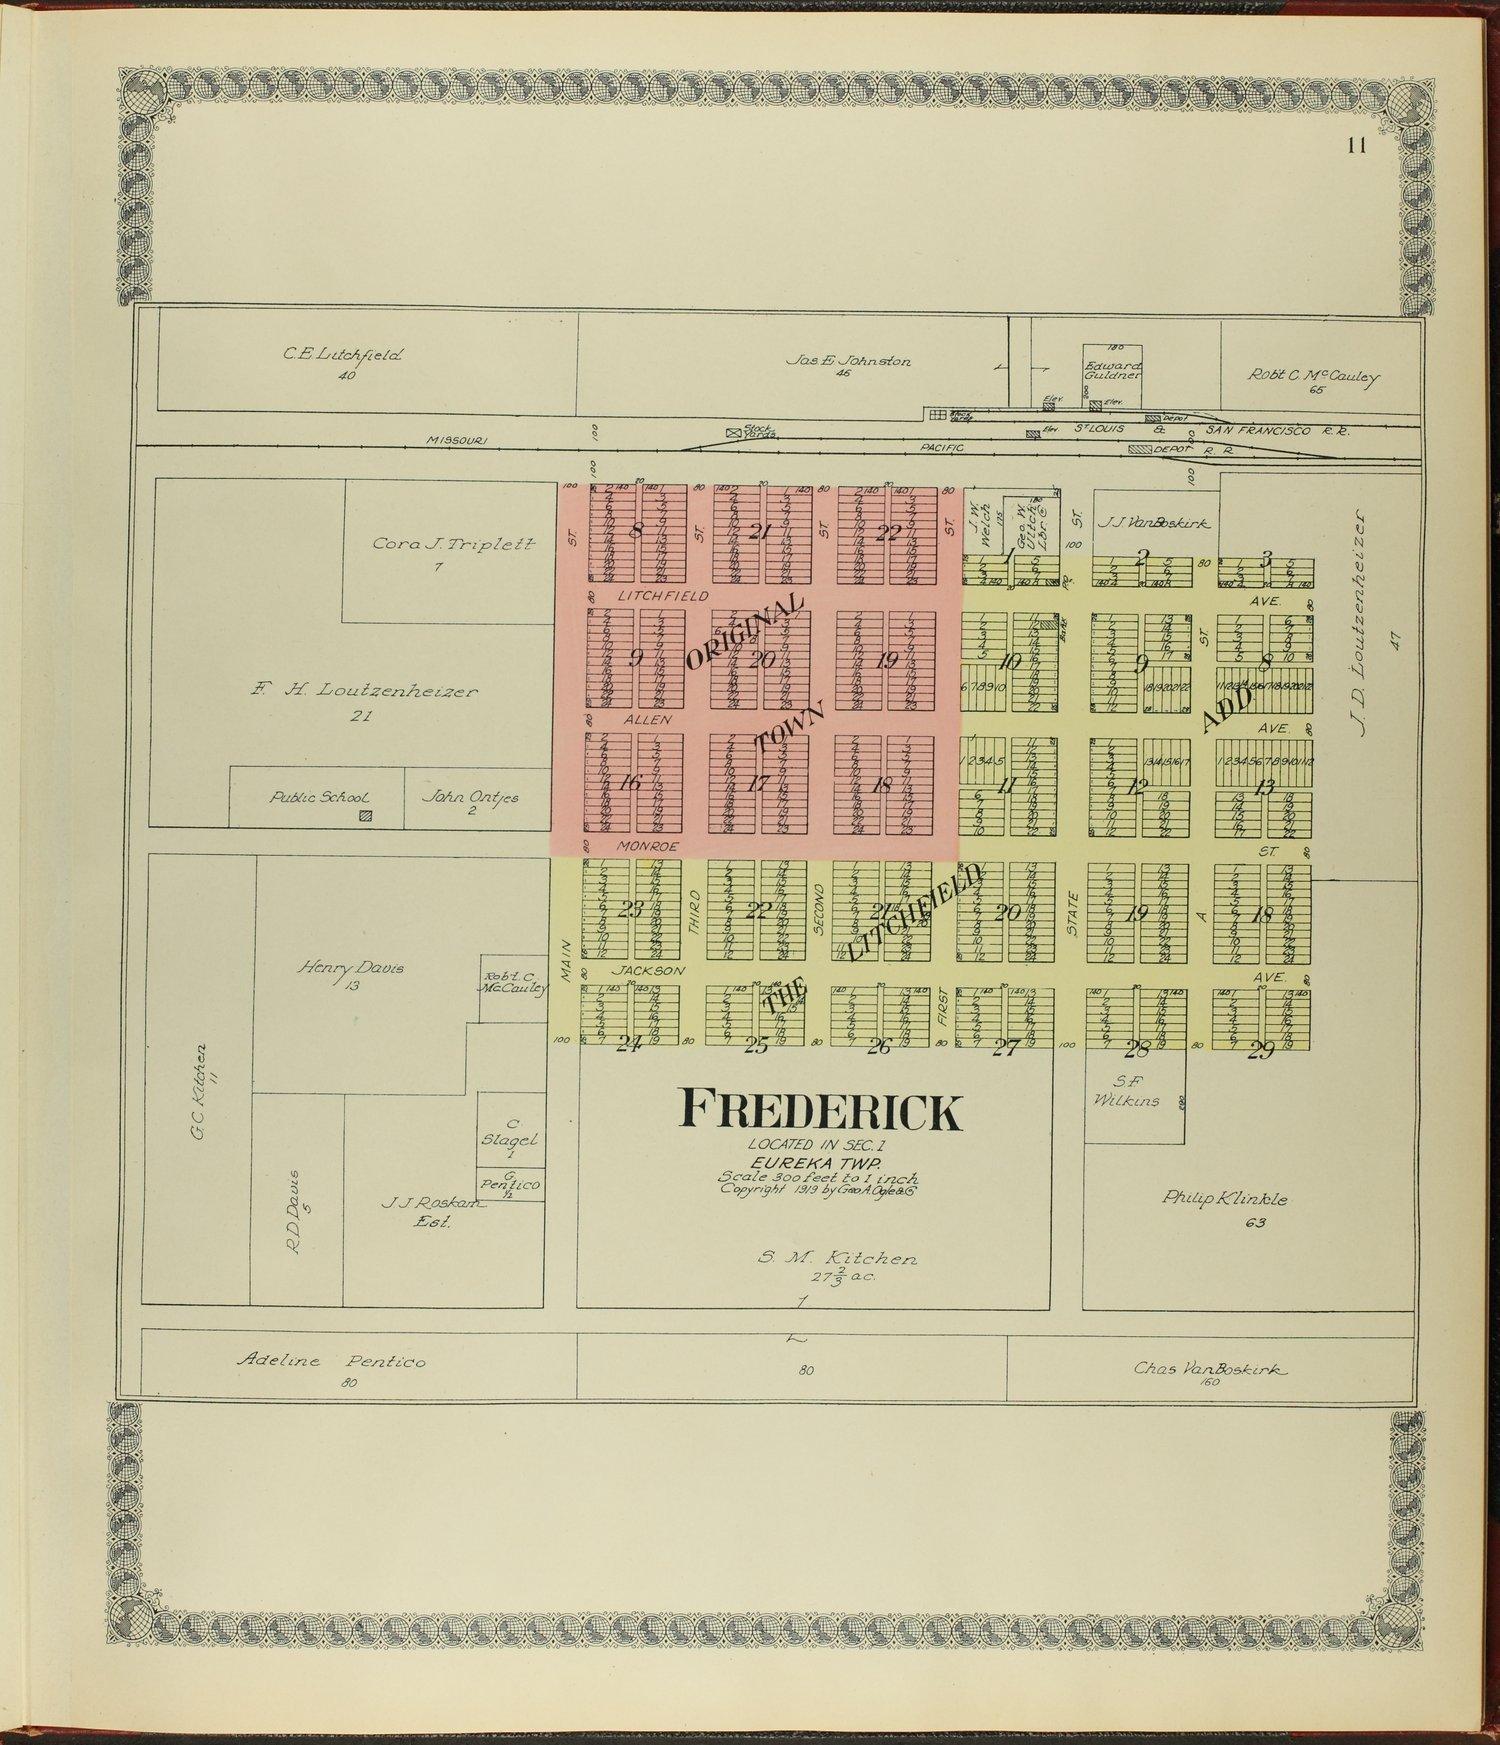 Standard atlas of Rice County, Kansas - 11